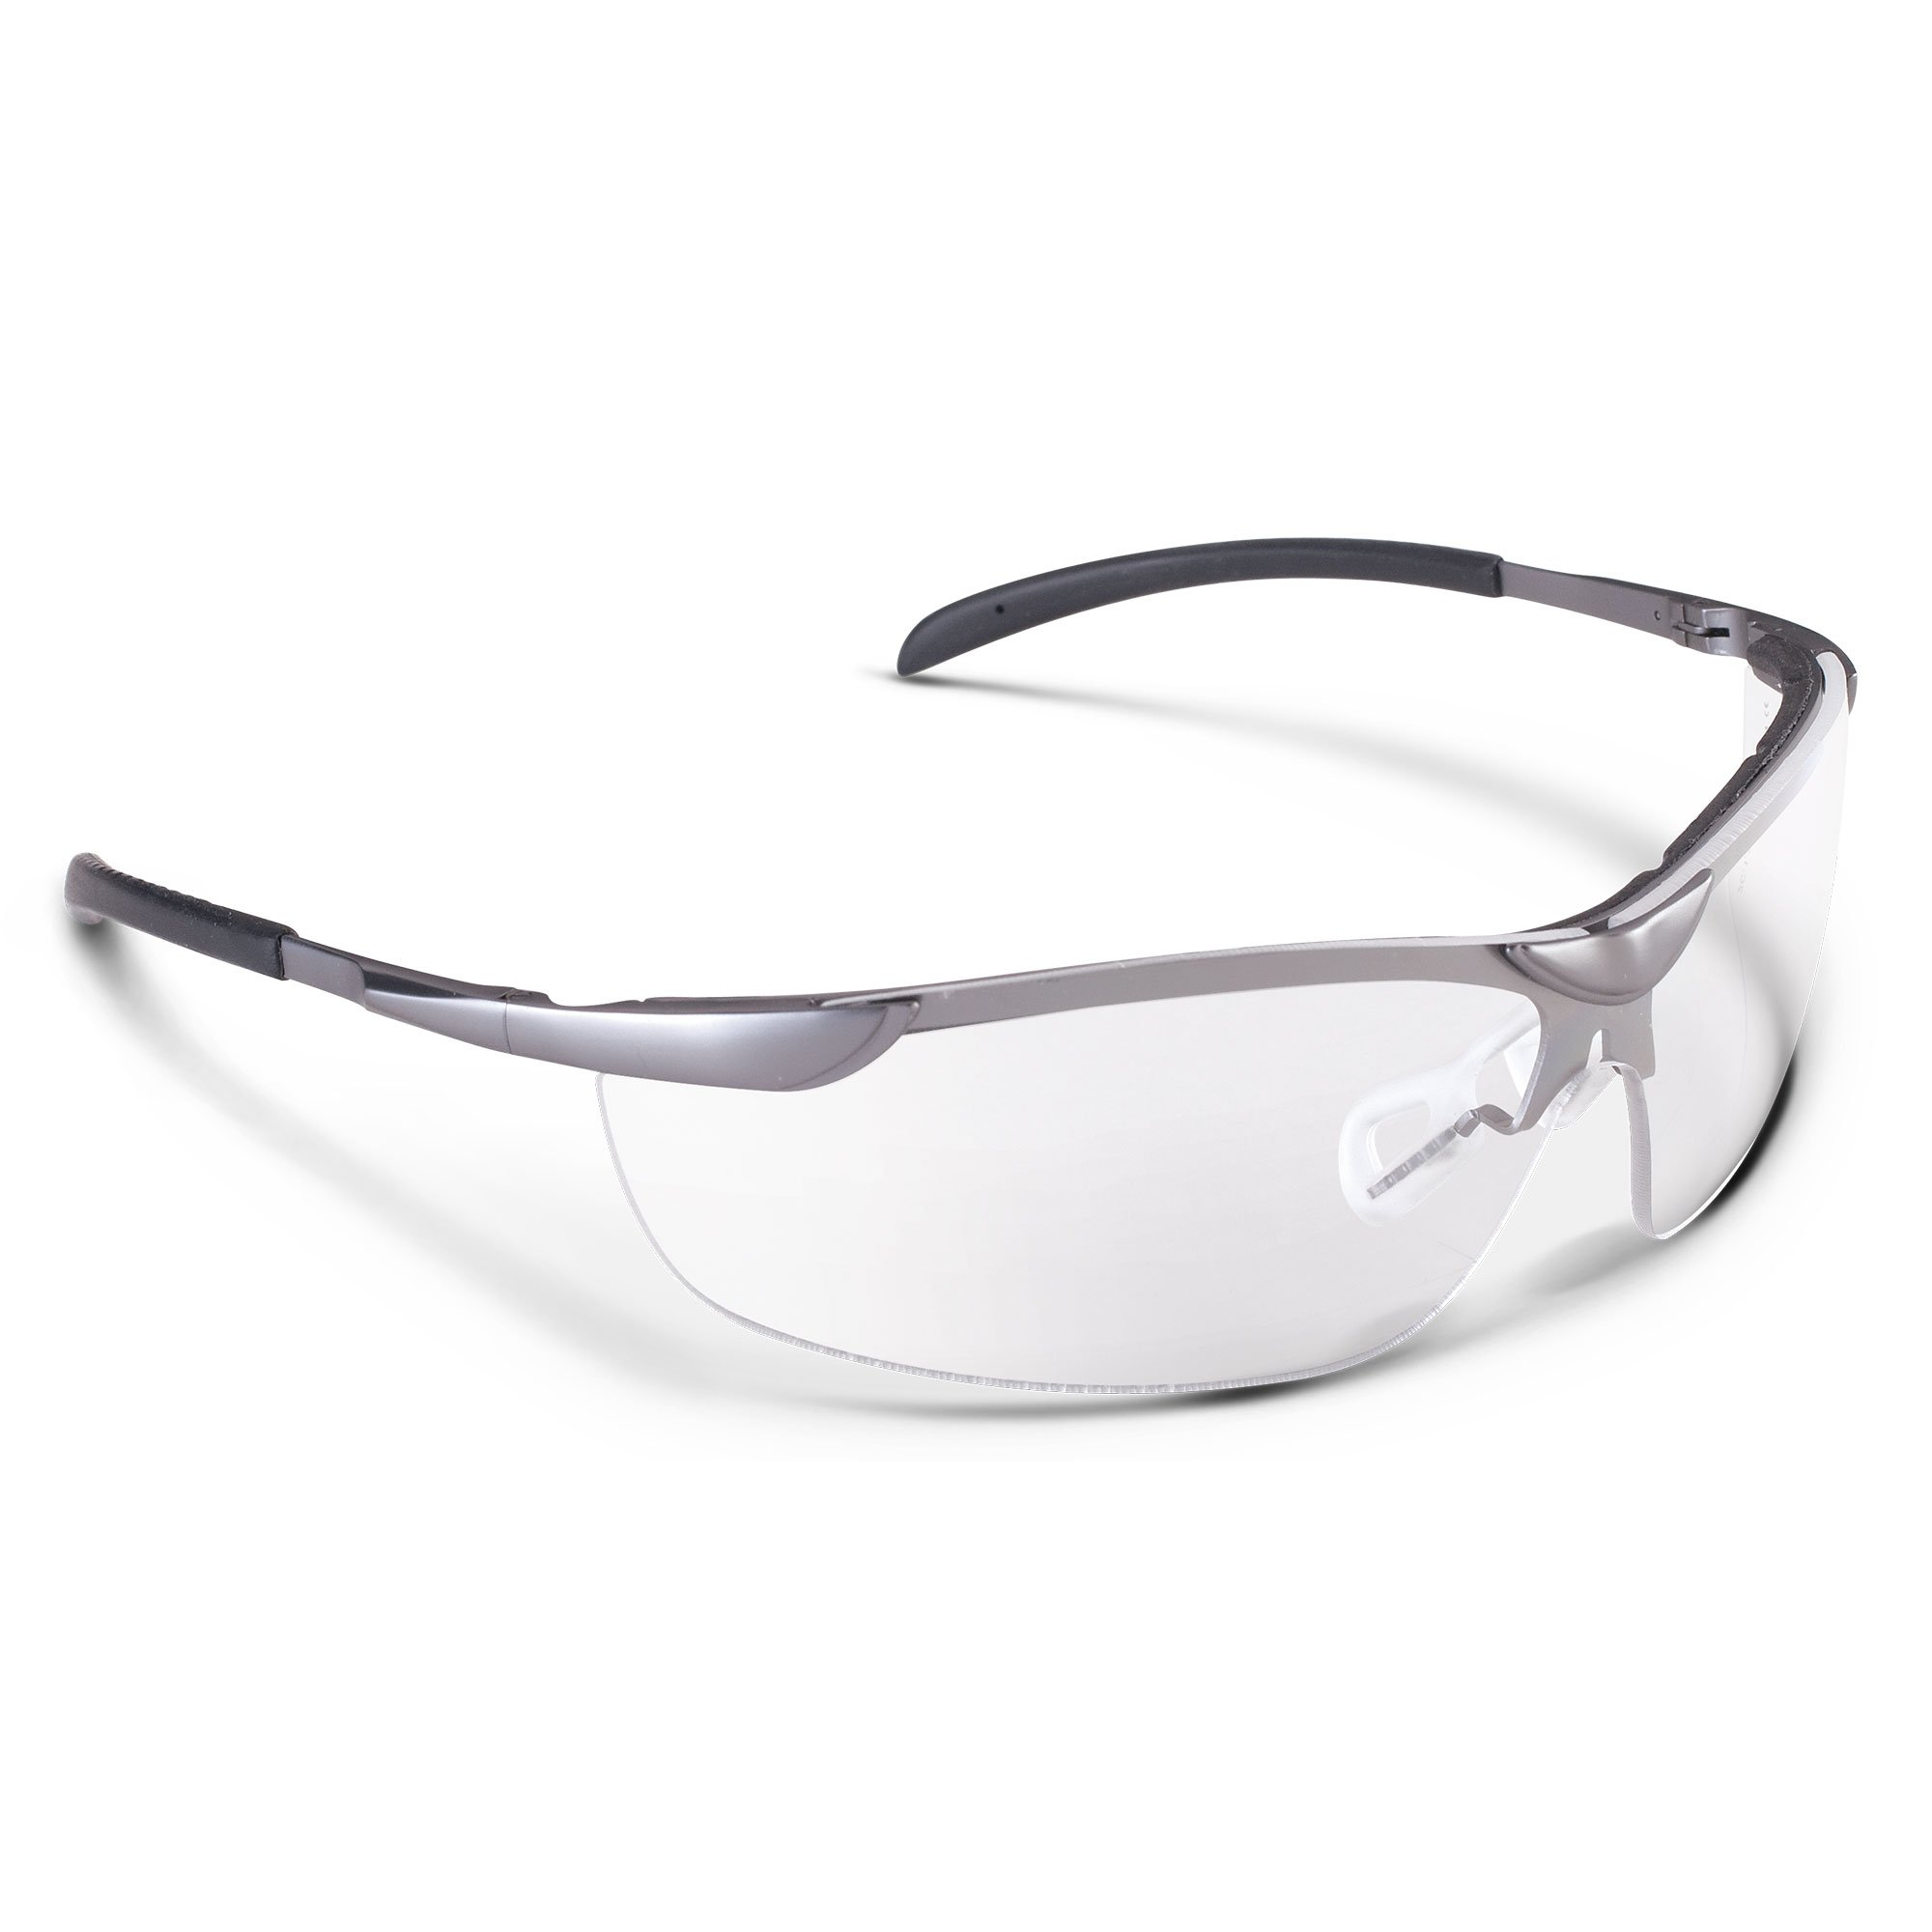 Practicon 7113015 557 Flex Metal Safety Glasses